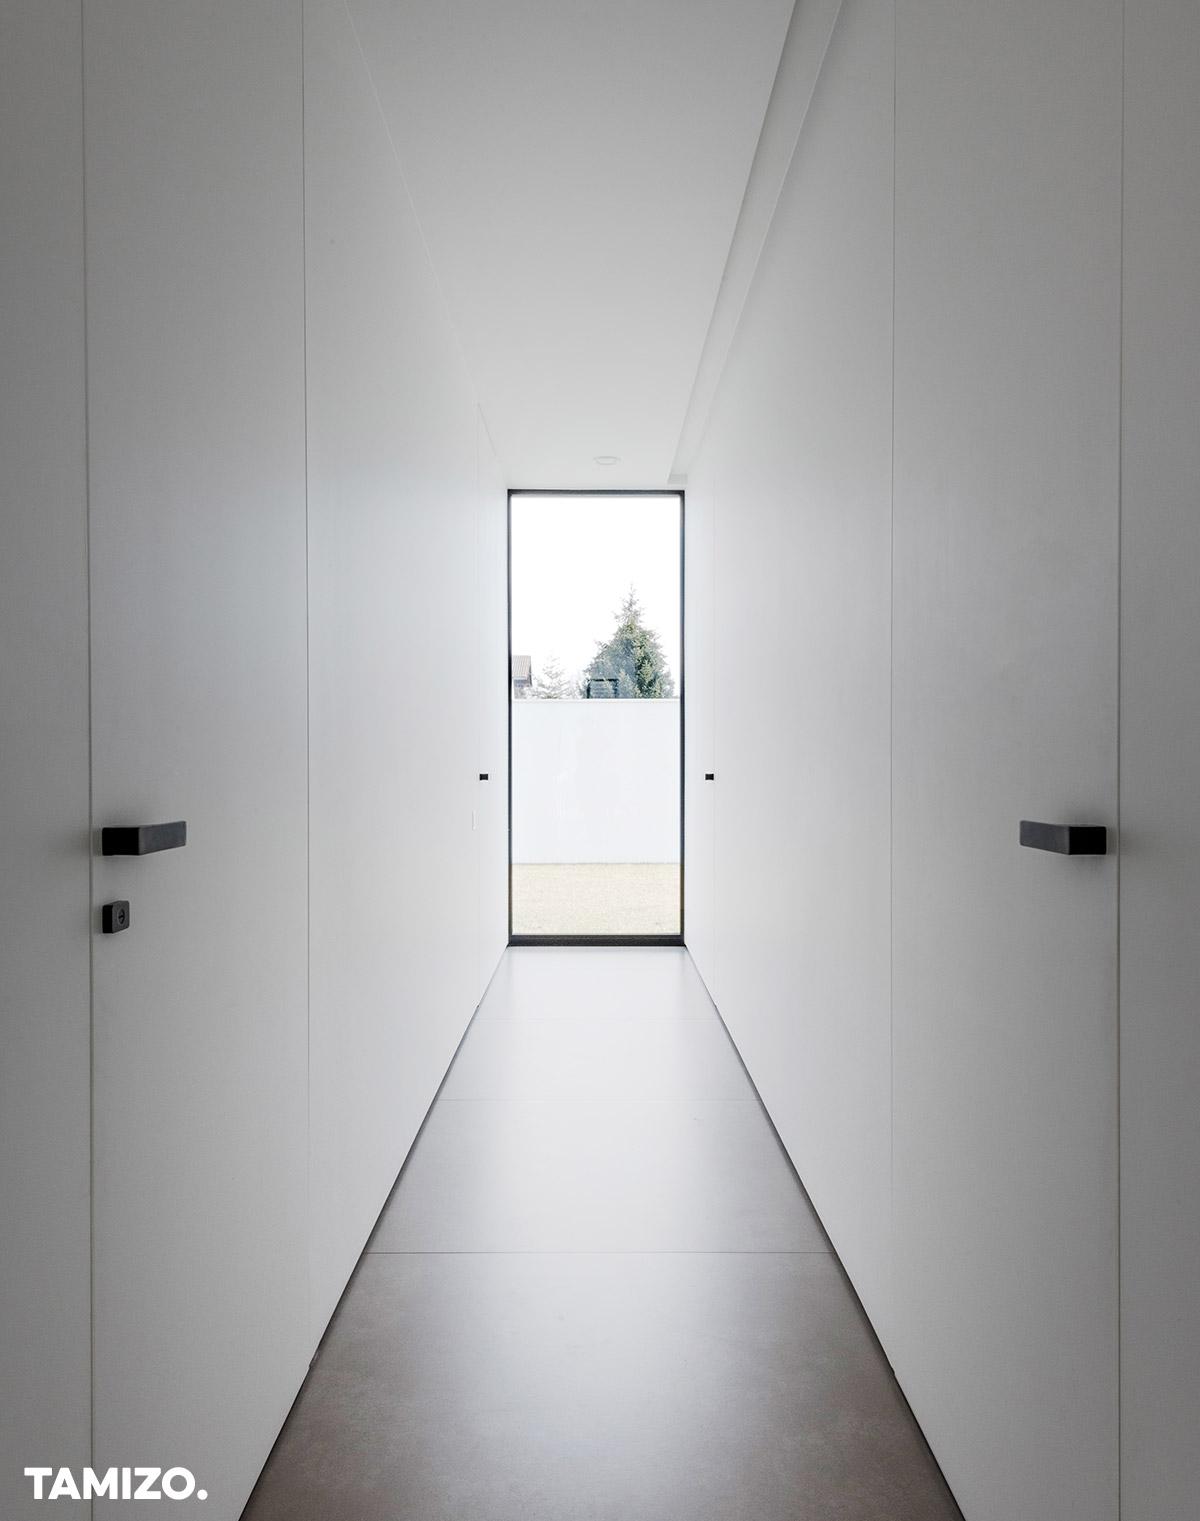 027_tamizo_architects_interior_house_realization_warsaw_poland_22